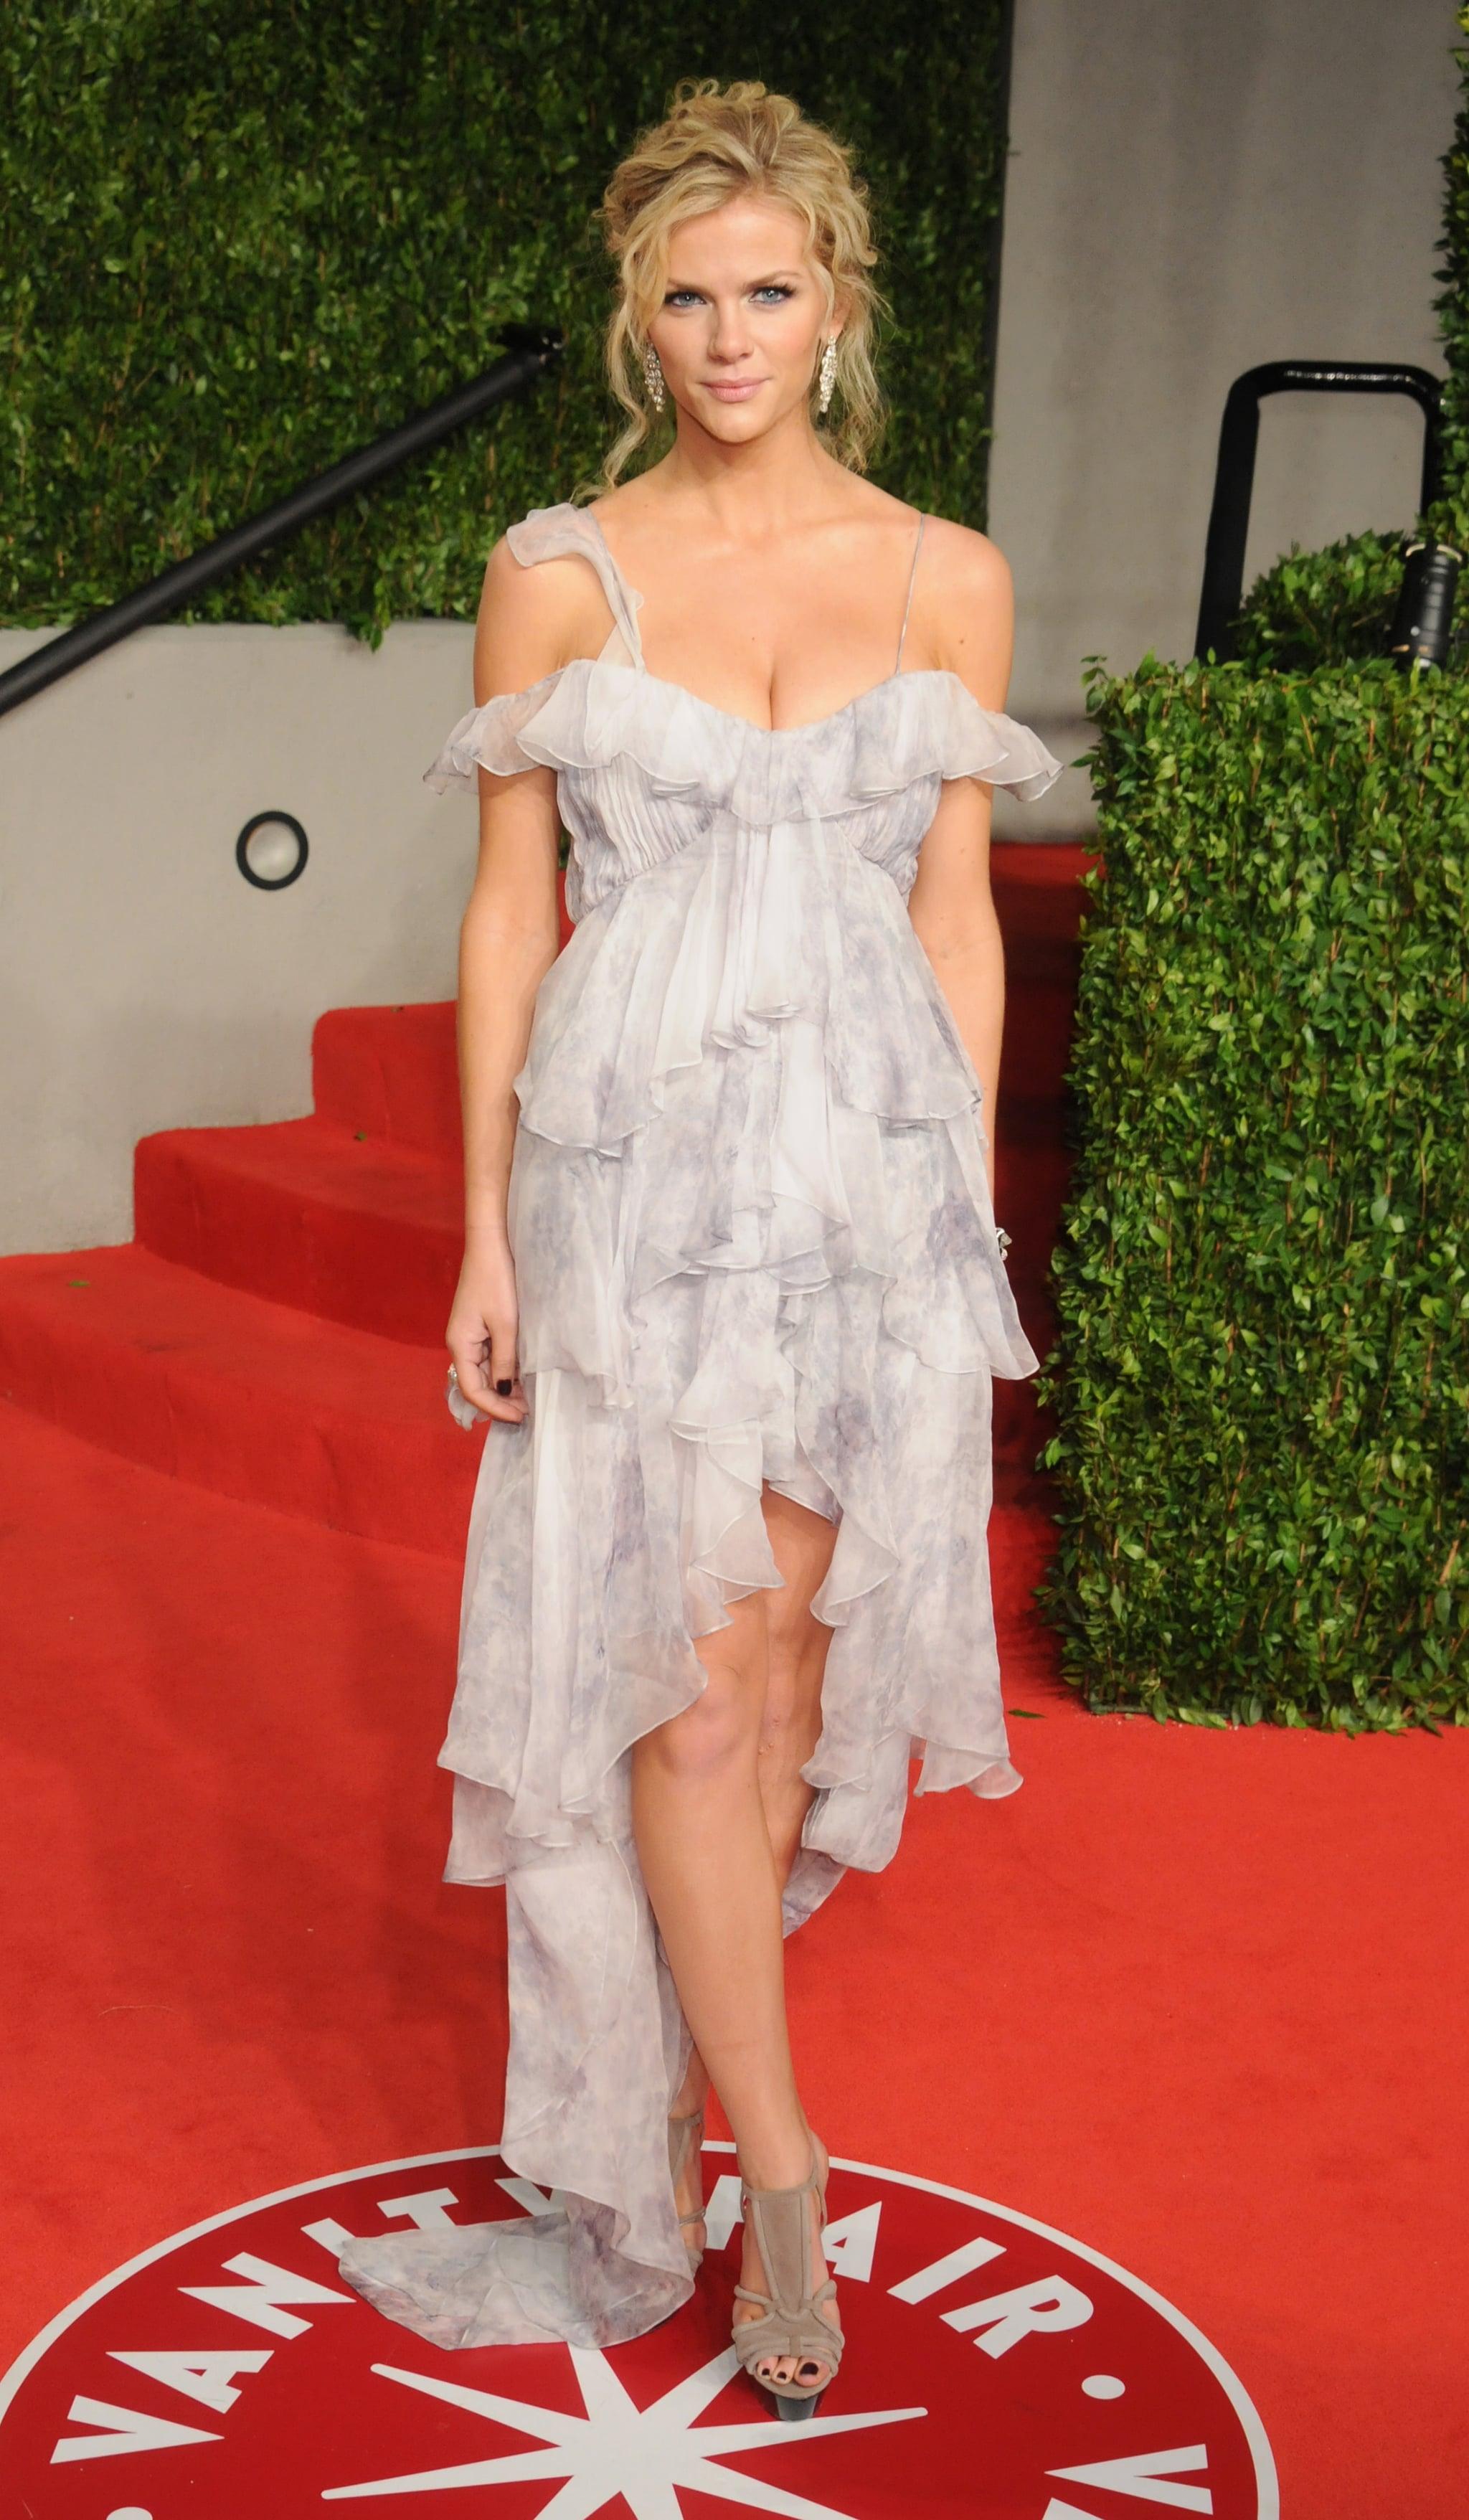 Brooklyn Decker in Ruffled Joy Cioci at 2011 Vanity Fair Oscars Party